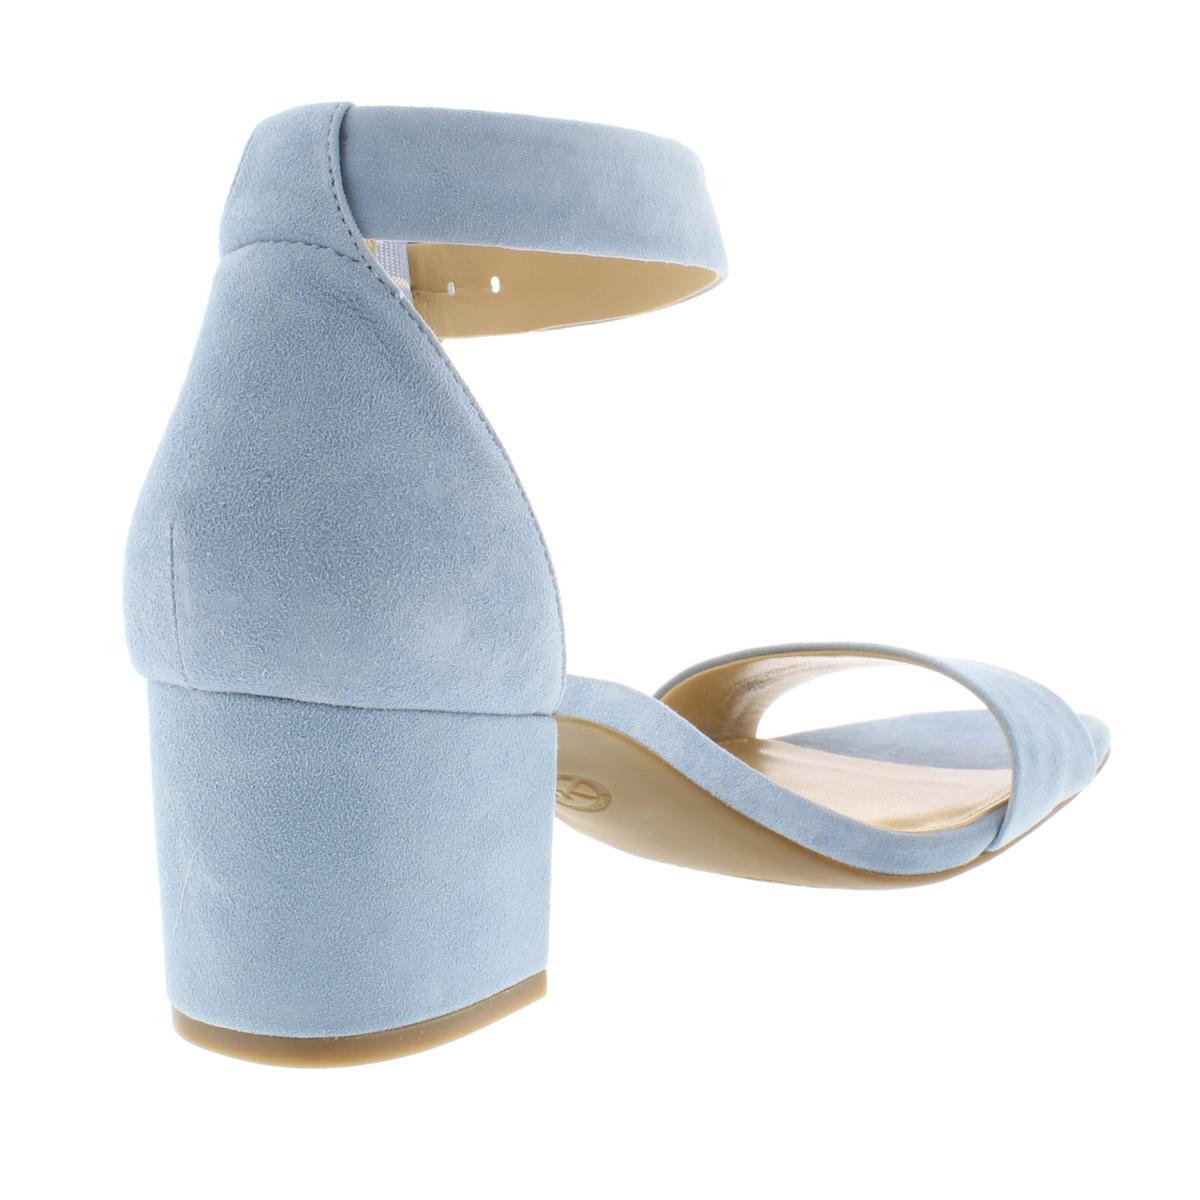 MICHAEL-Michael-Kors-Womens-Lena-Ankle-Strap-Dress-Sandals-Evening-BHFO-6788 thumbnail 5